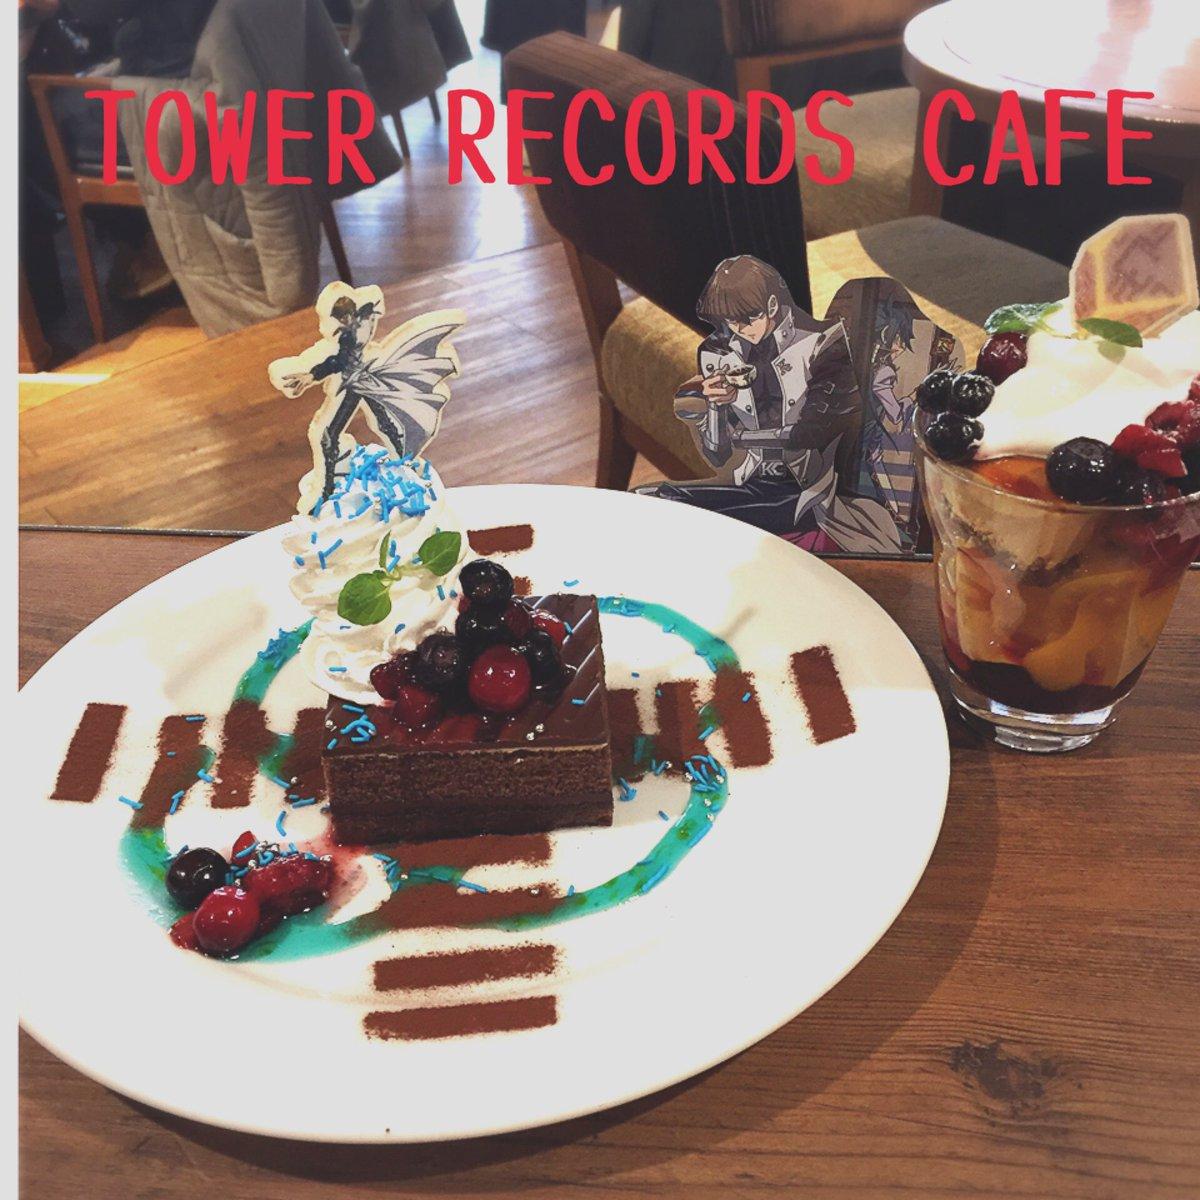 【TOWER RECORDS CAFE】劇場版『遊☆戯☆王』コラボは残り5日です!予約はこちらから🌟…